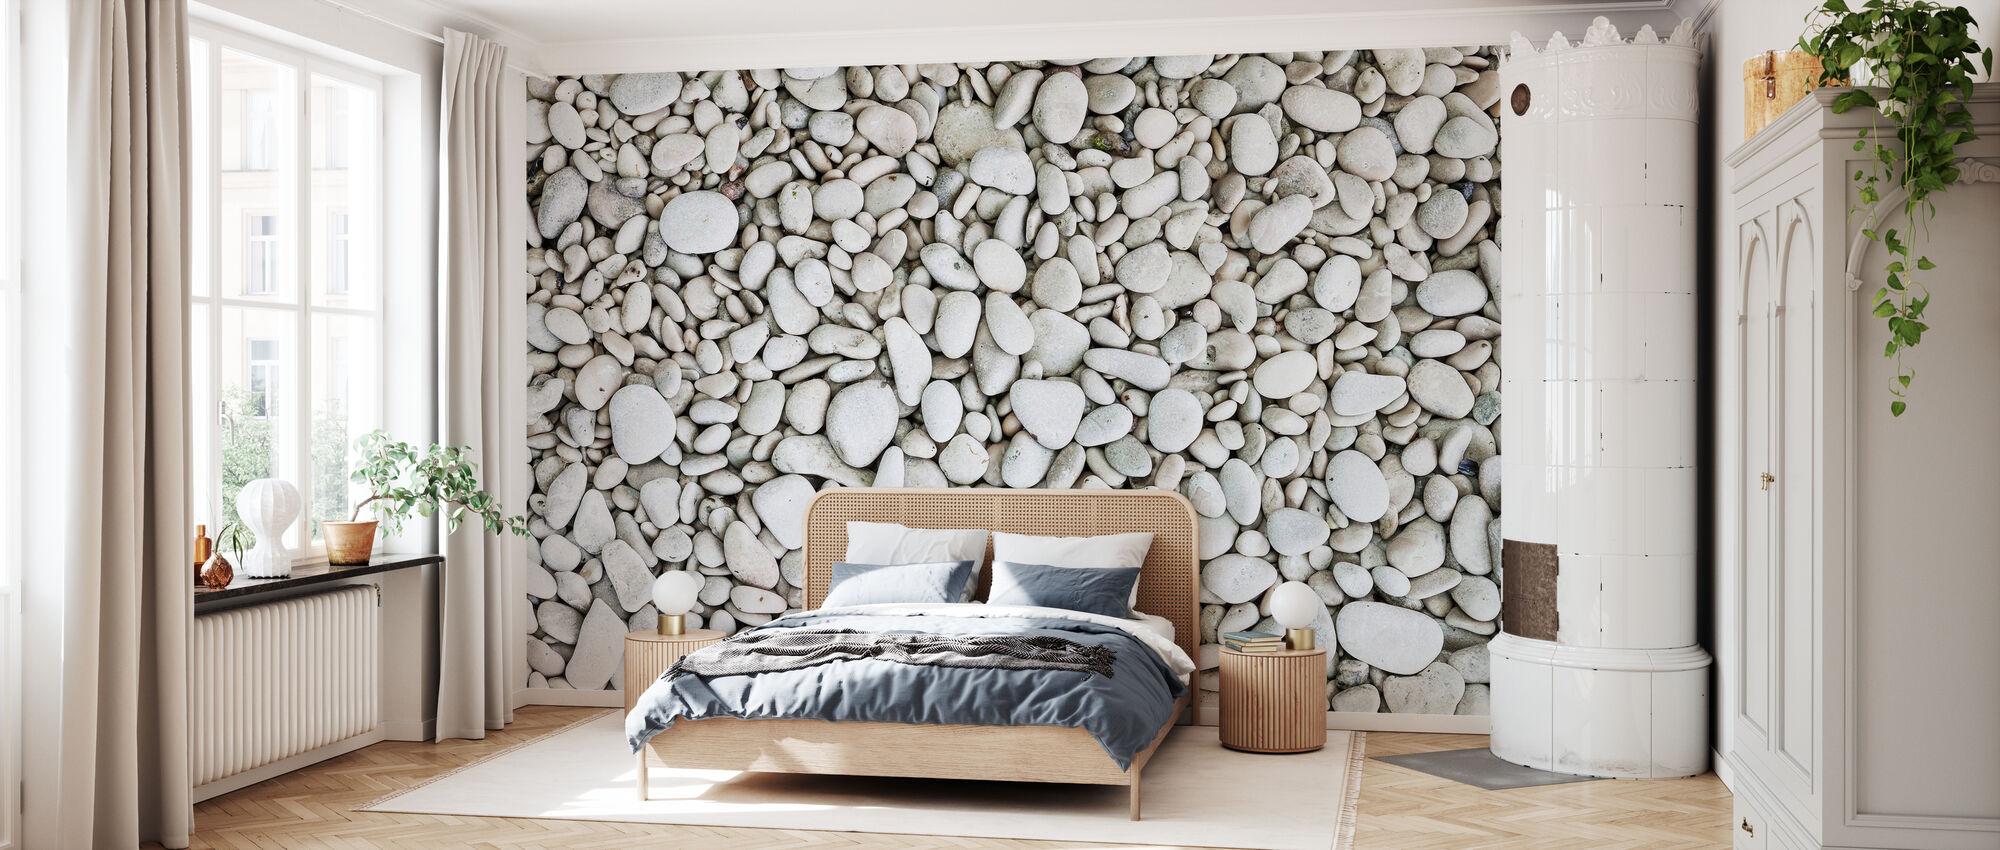 Small Stones - Wallpaper - Bedroom